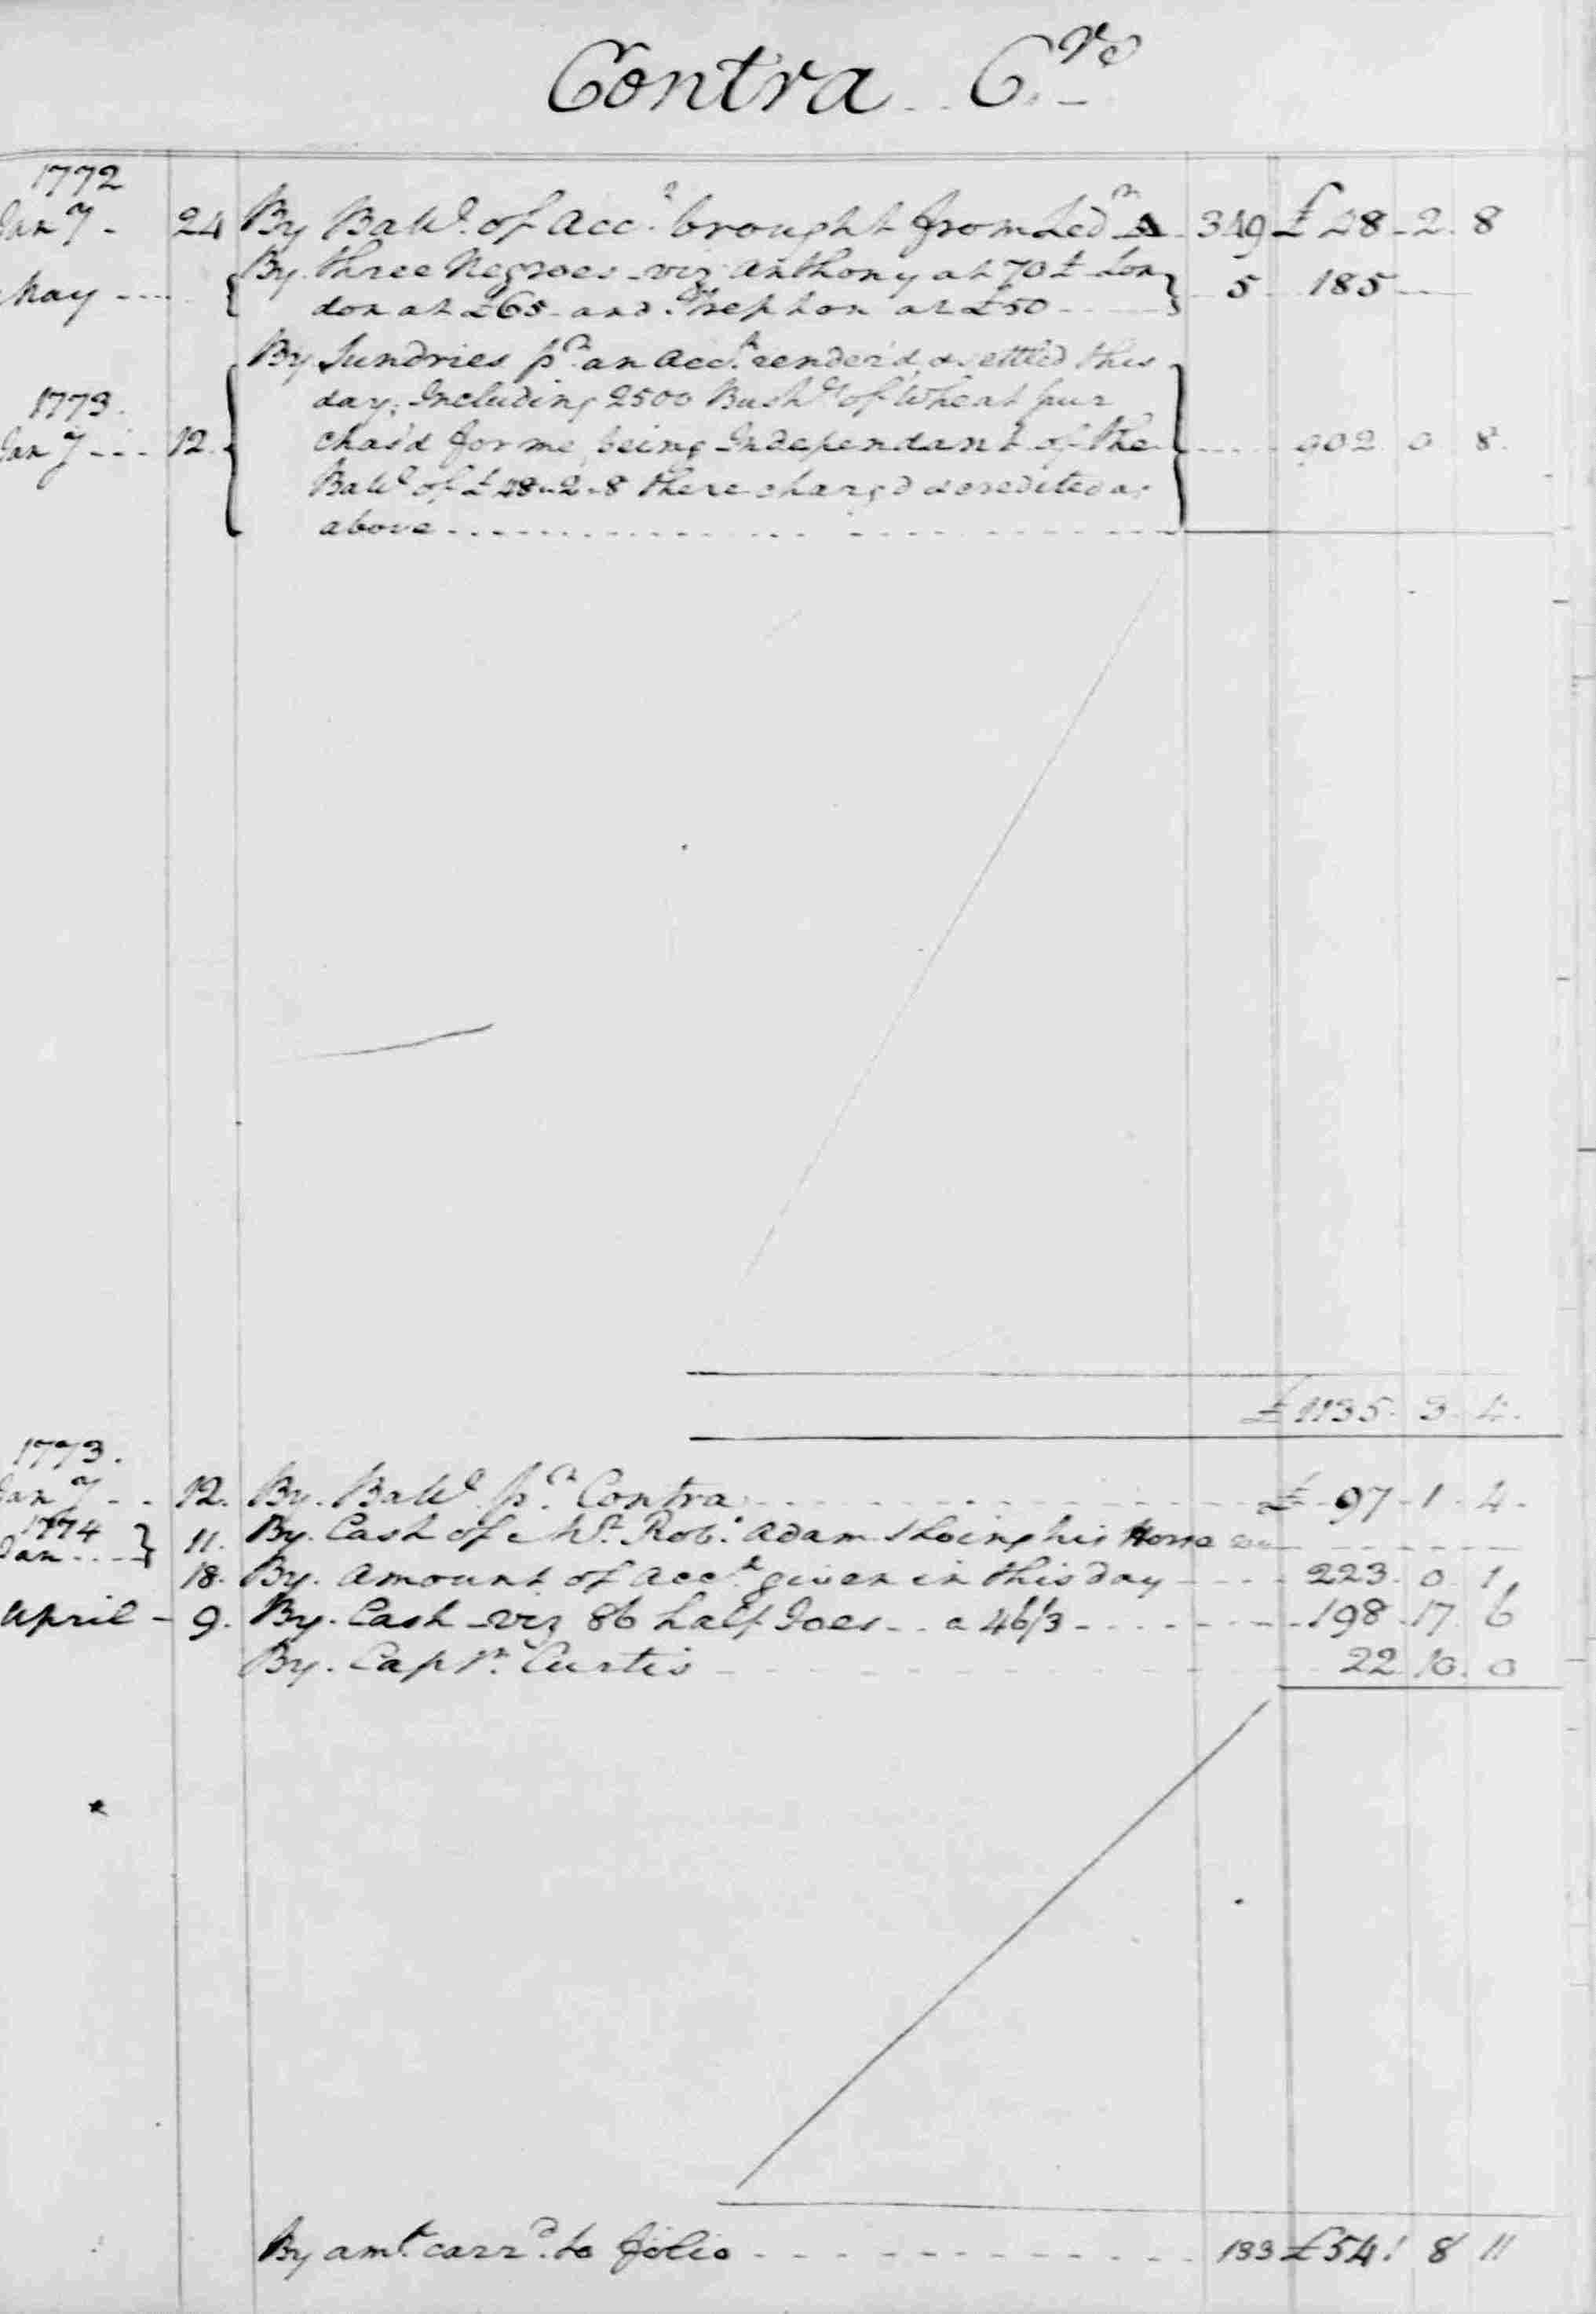 Ledger B, folio 42, right side